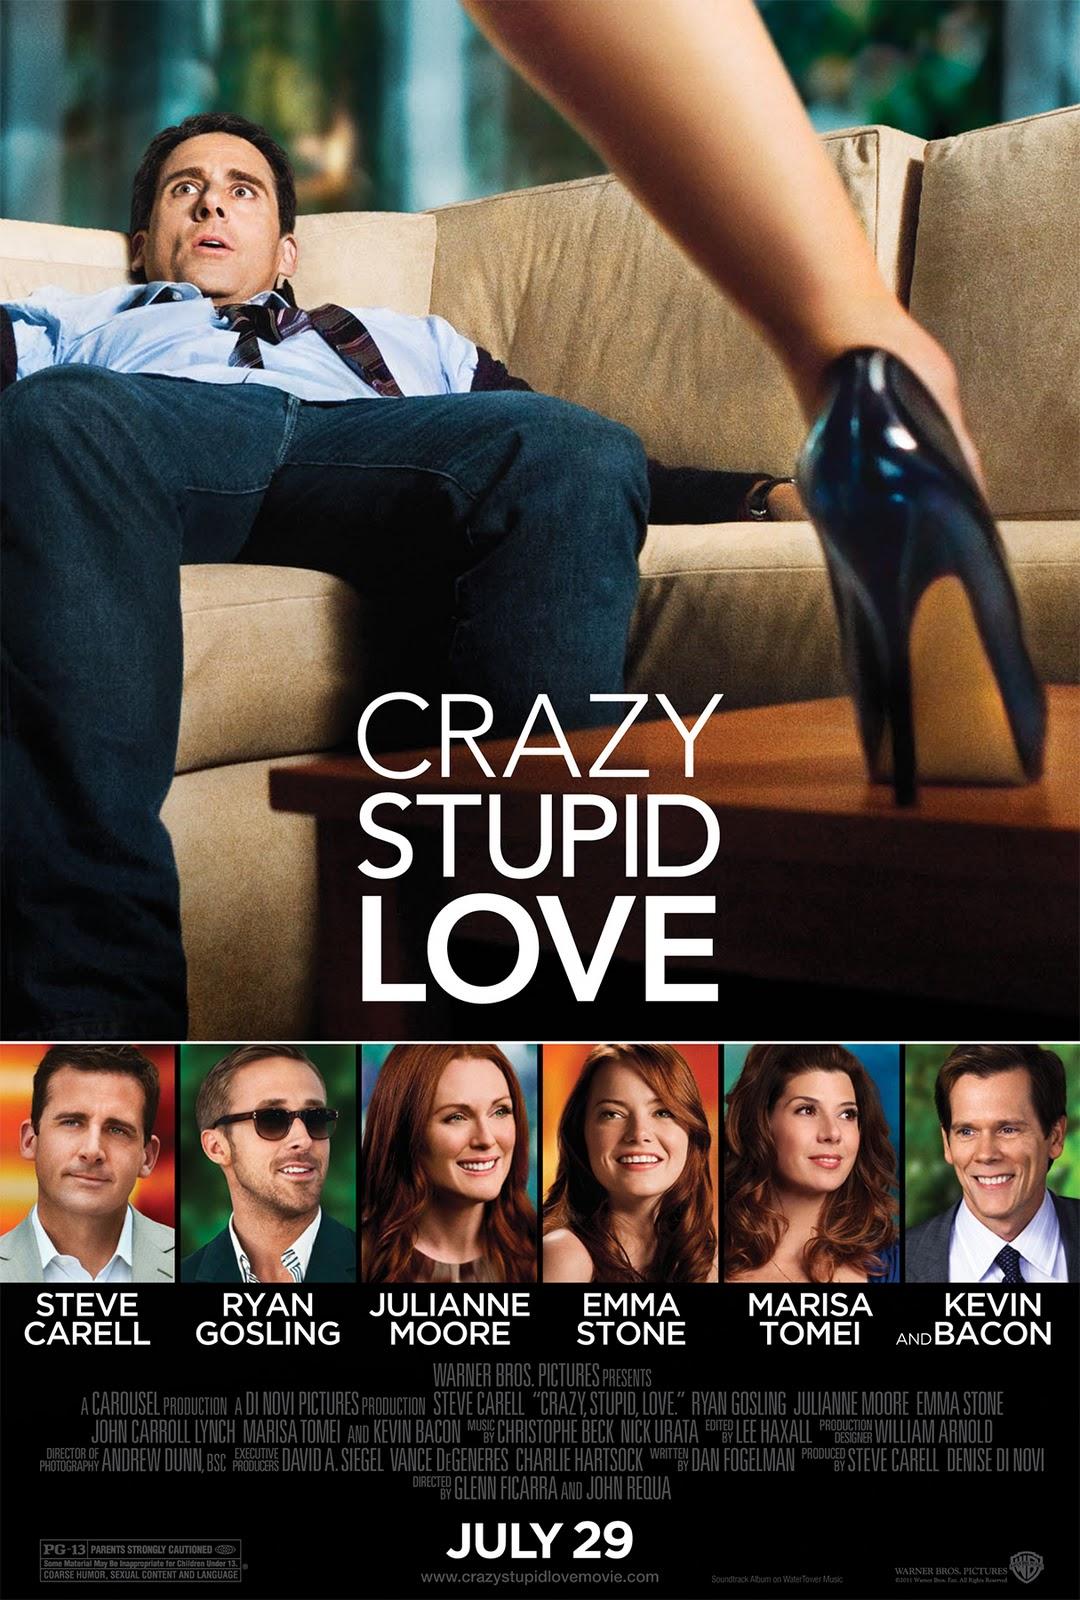 http://1.bp.blogspot.com/-2flm1_GLESM/TppYiSwpiLI/AAAAAAAAAMw/ECiTDjXItWc/s1600/crazy-stupid-love-movie-poster1.jpg